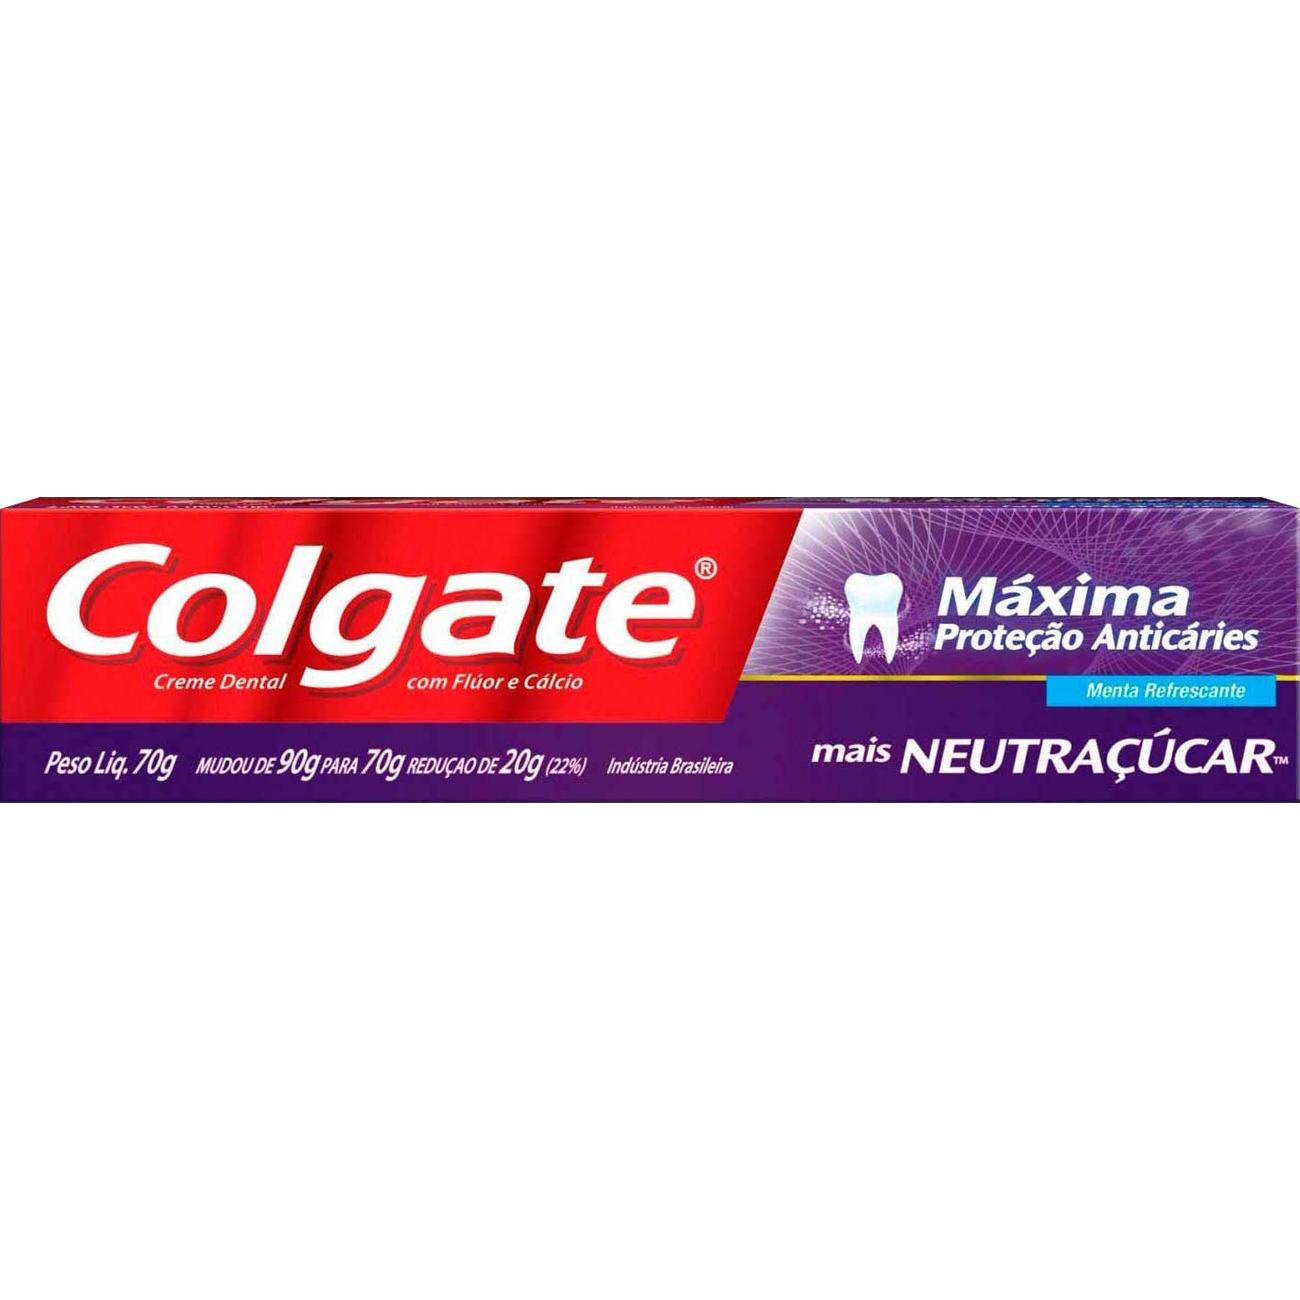 Creme Dental Colgate Maxima Protecao Anticaries + Neutr